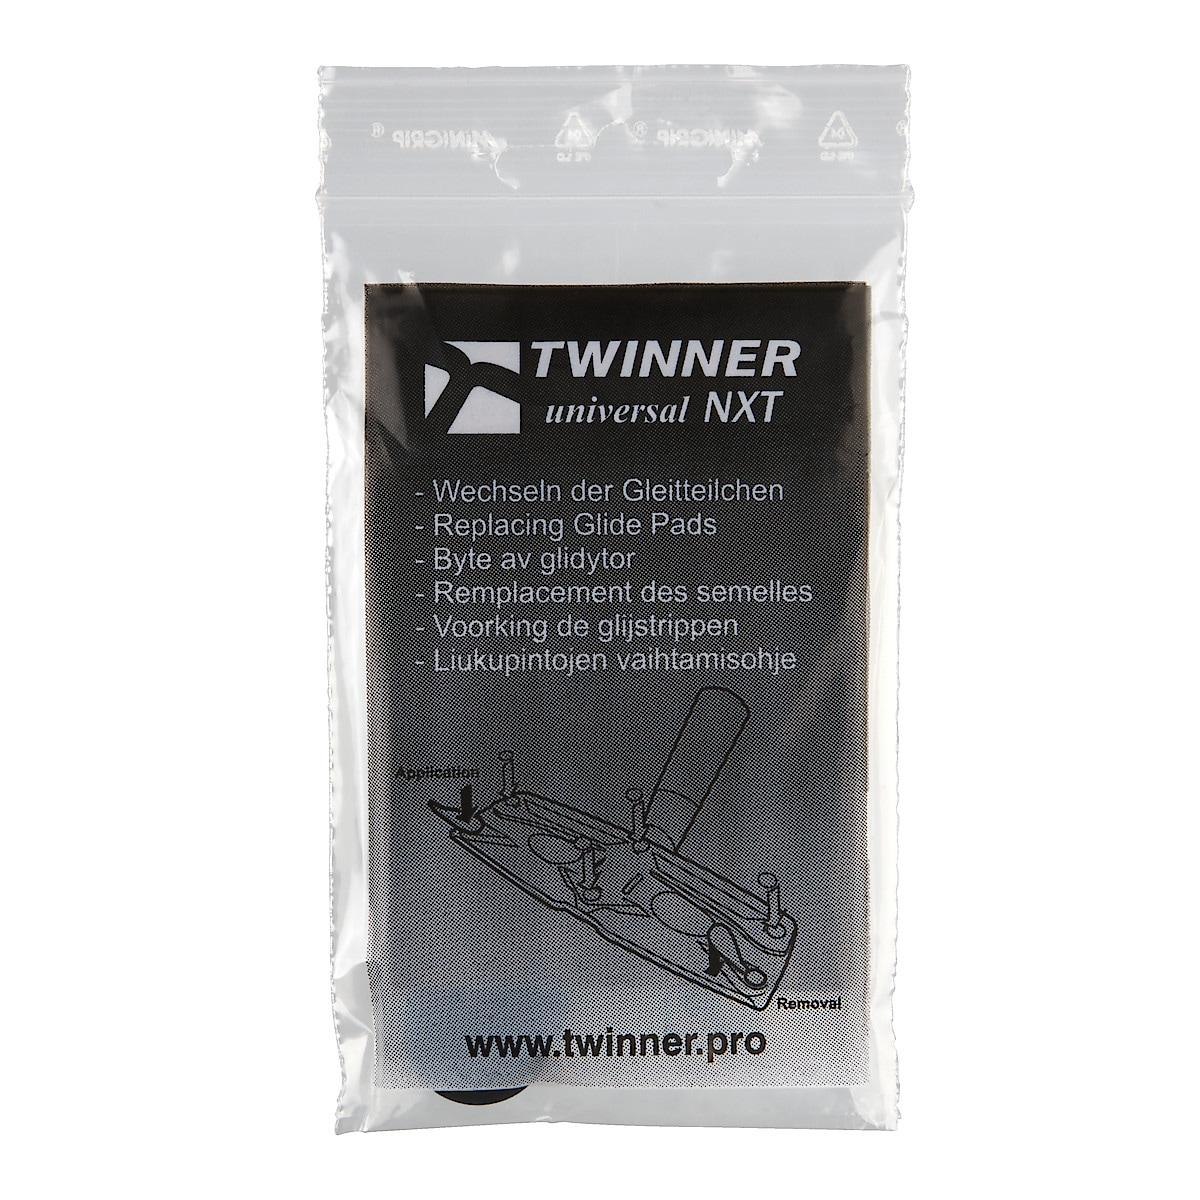 Twinner NXT Glide Pads